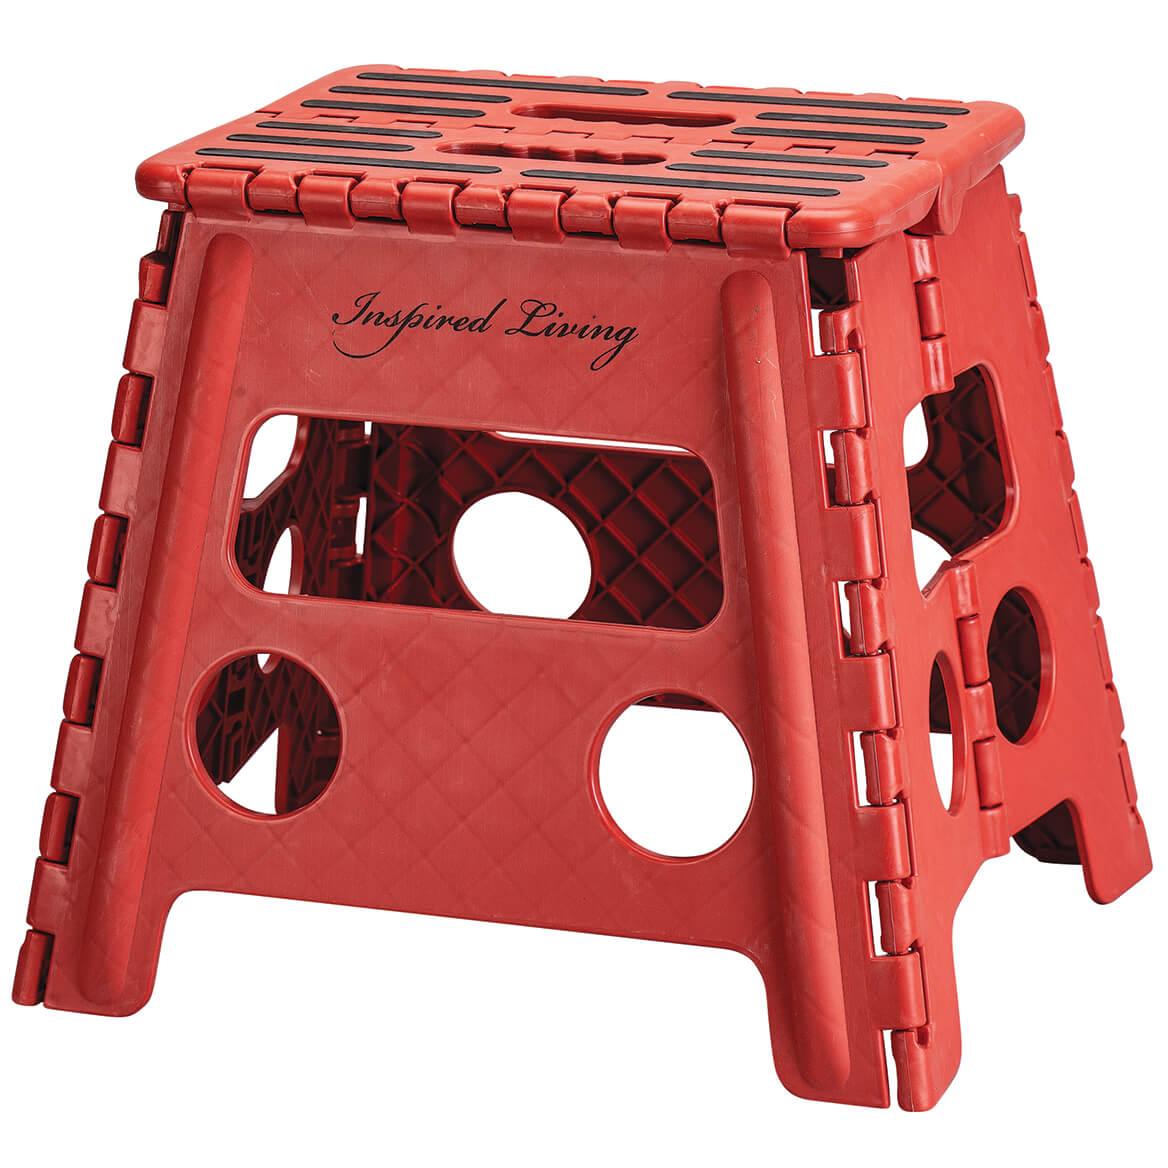 13 Inch Folding Step Stool-356931